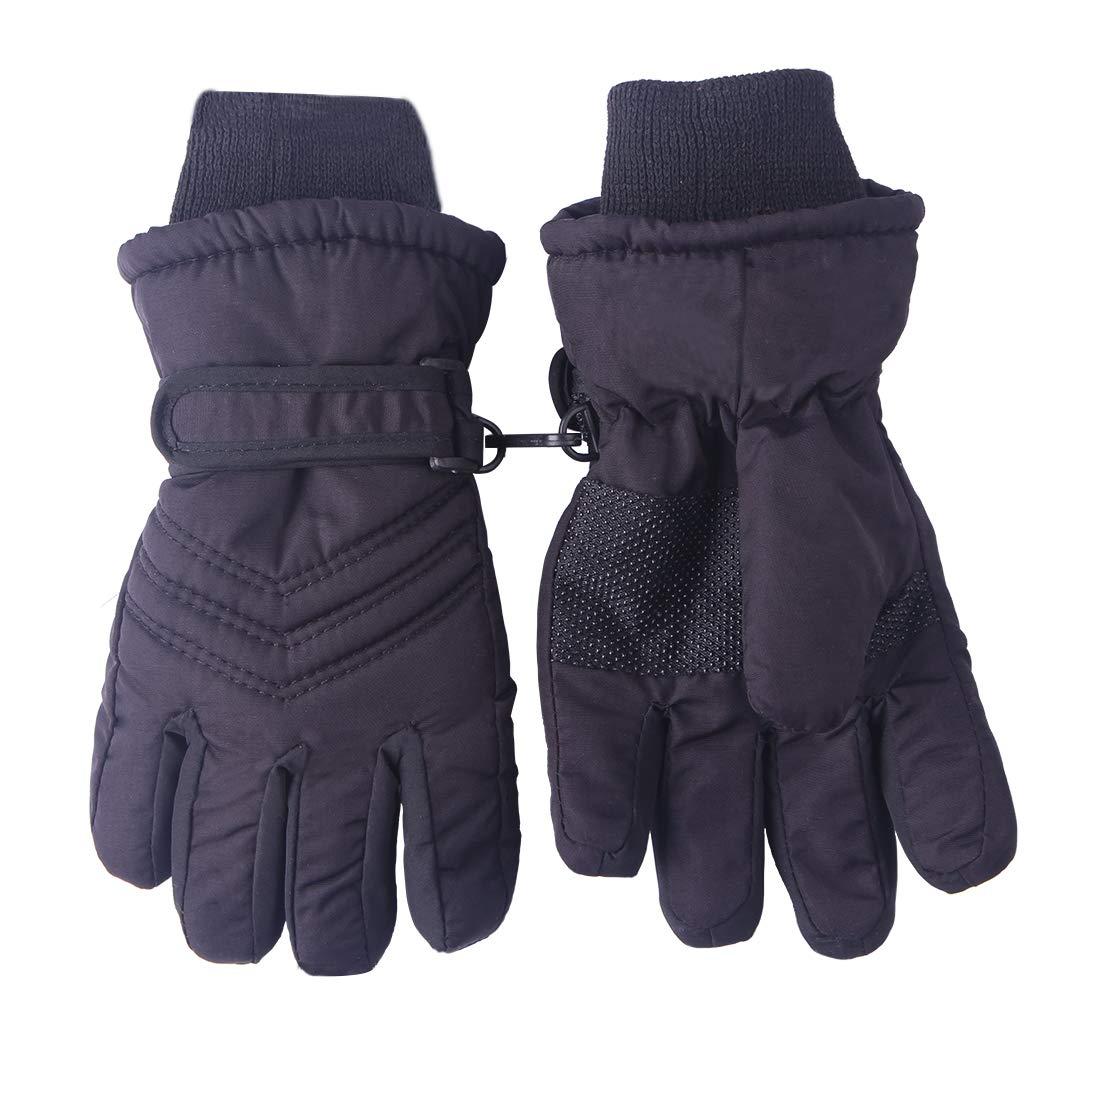 Kids Boys Girls Cold Whehter Winter Gloves Ski Driving Gloves Waterproof Black